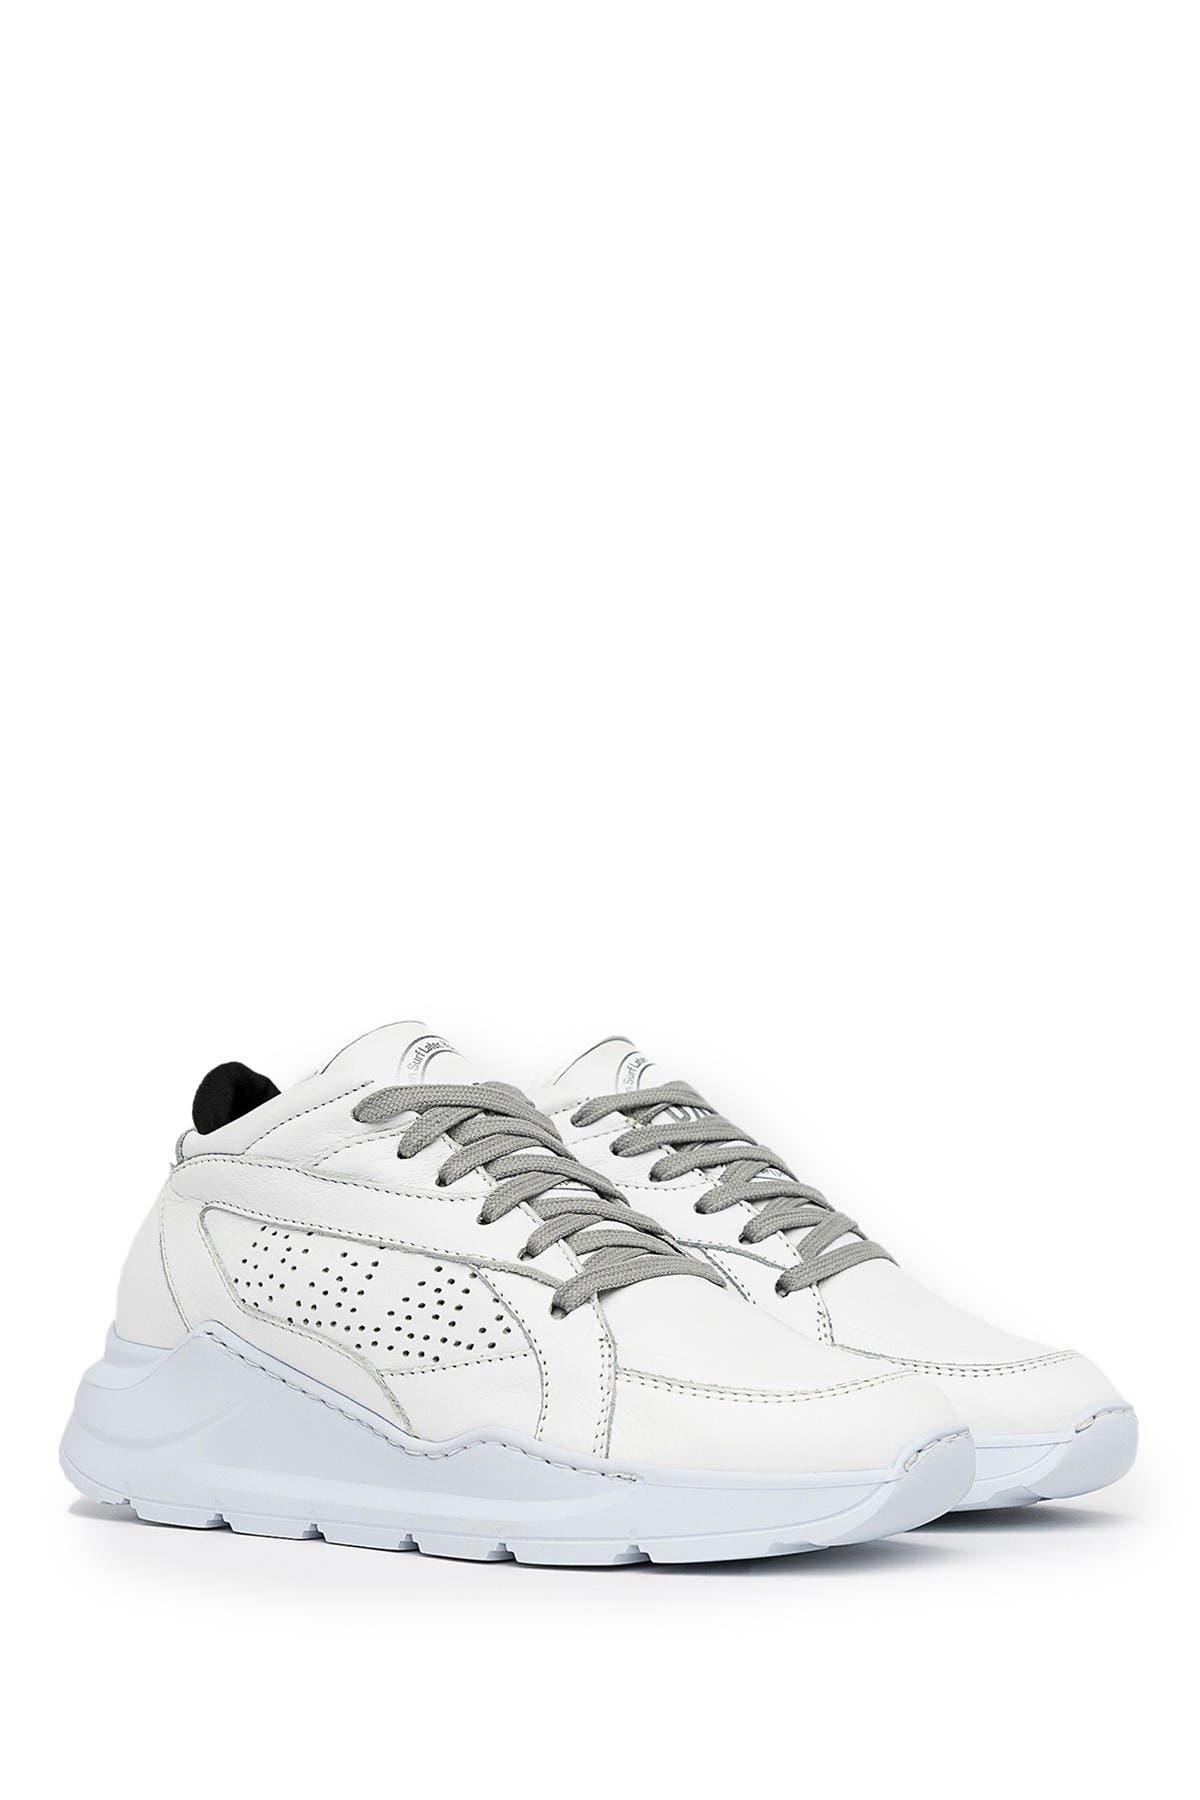 P448 | E9 Leia Dad Sneaker | Nordstrom Rack